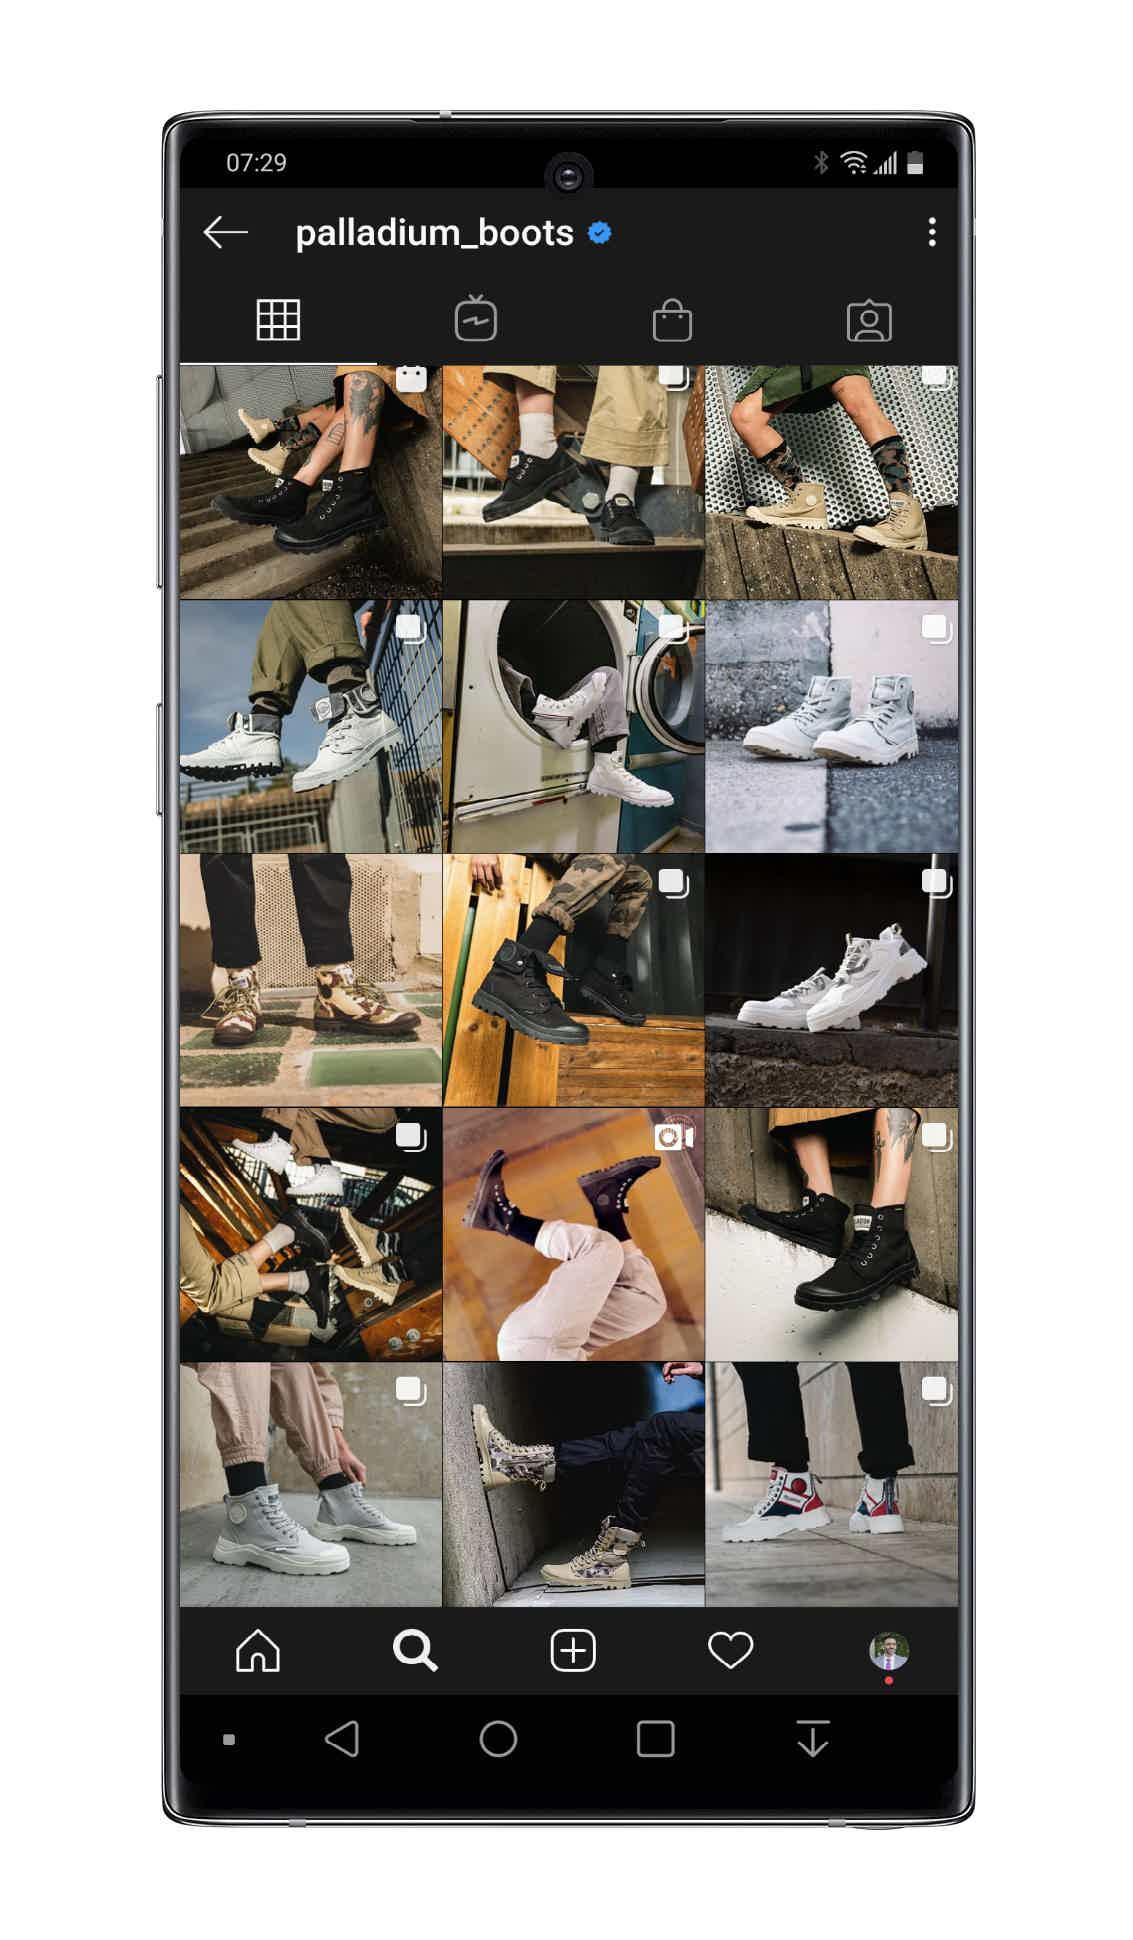 palladium boots instagram